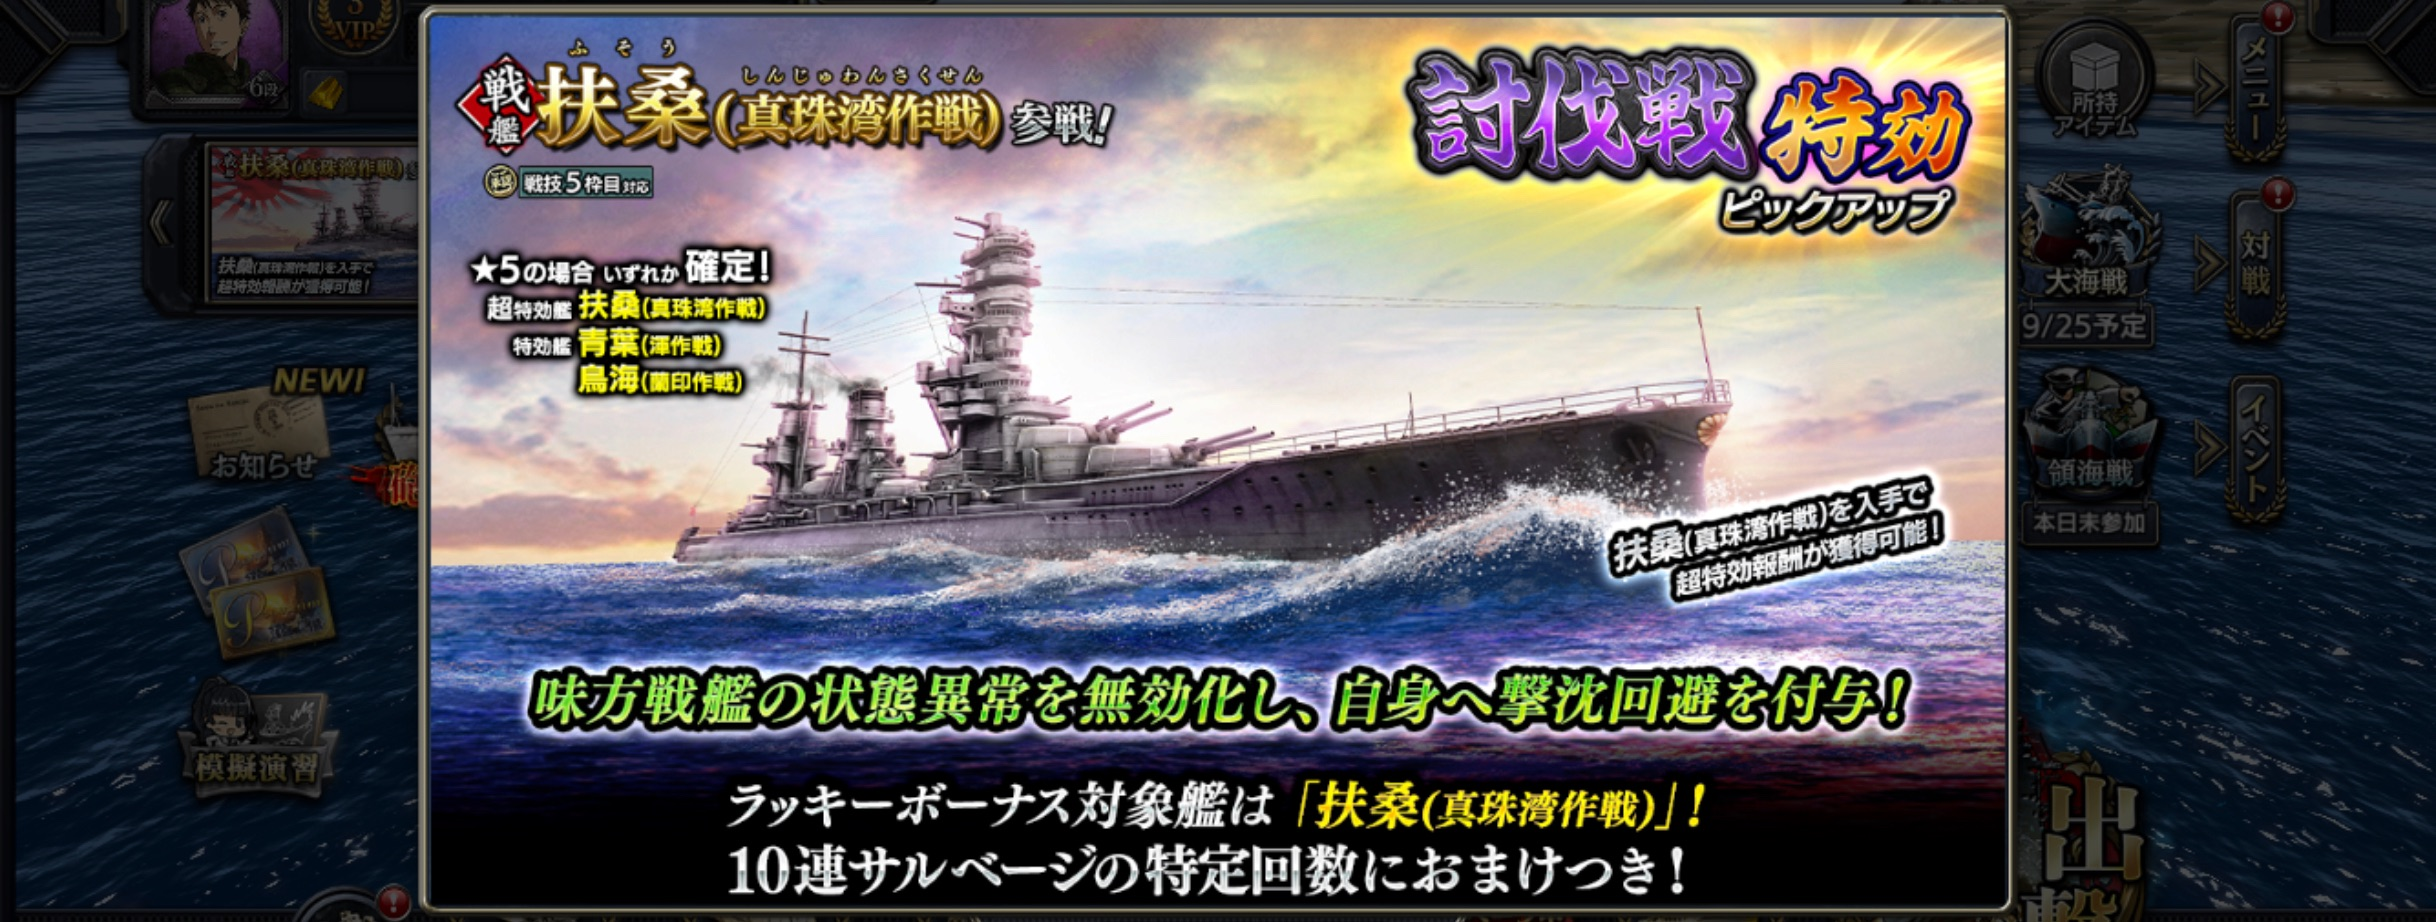 battleship-FusoP